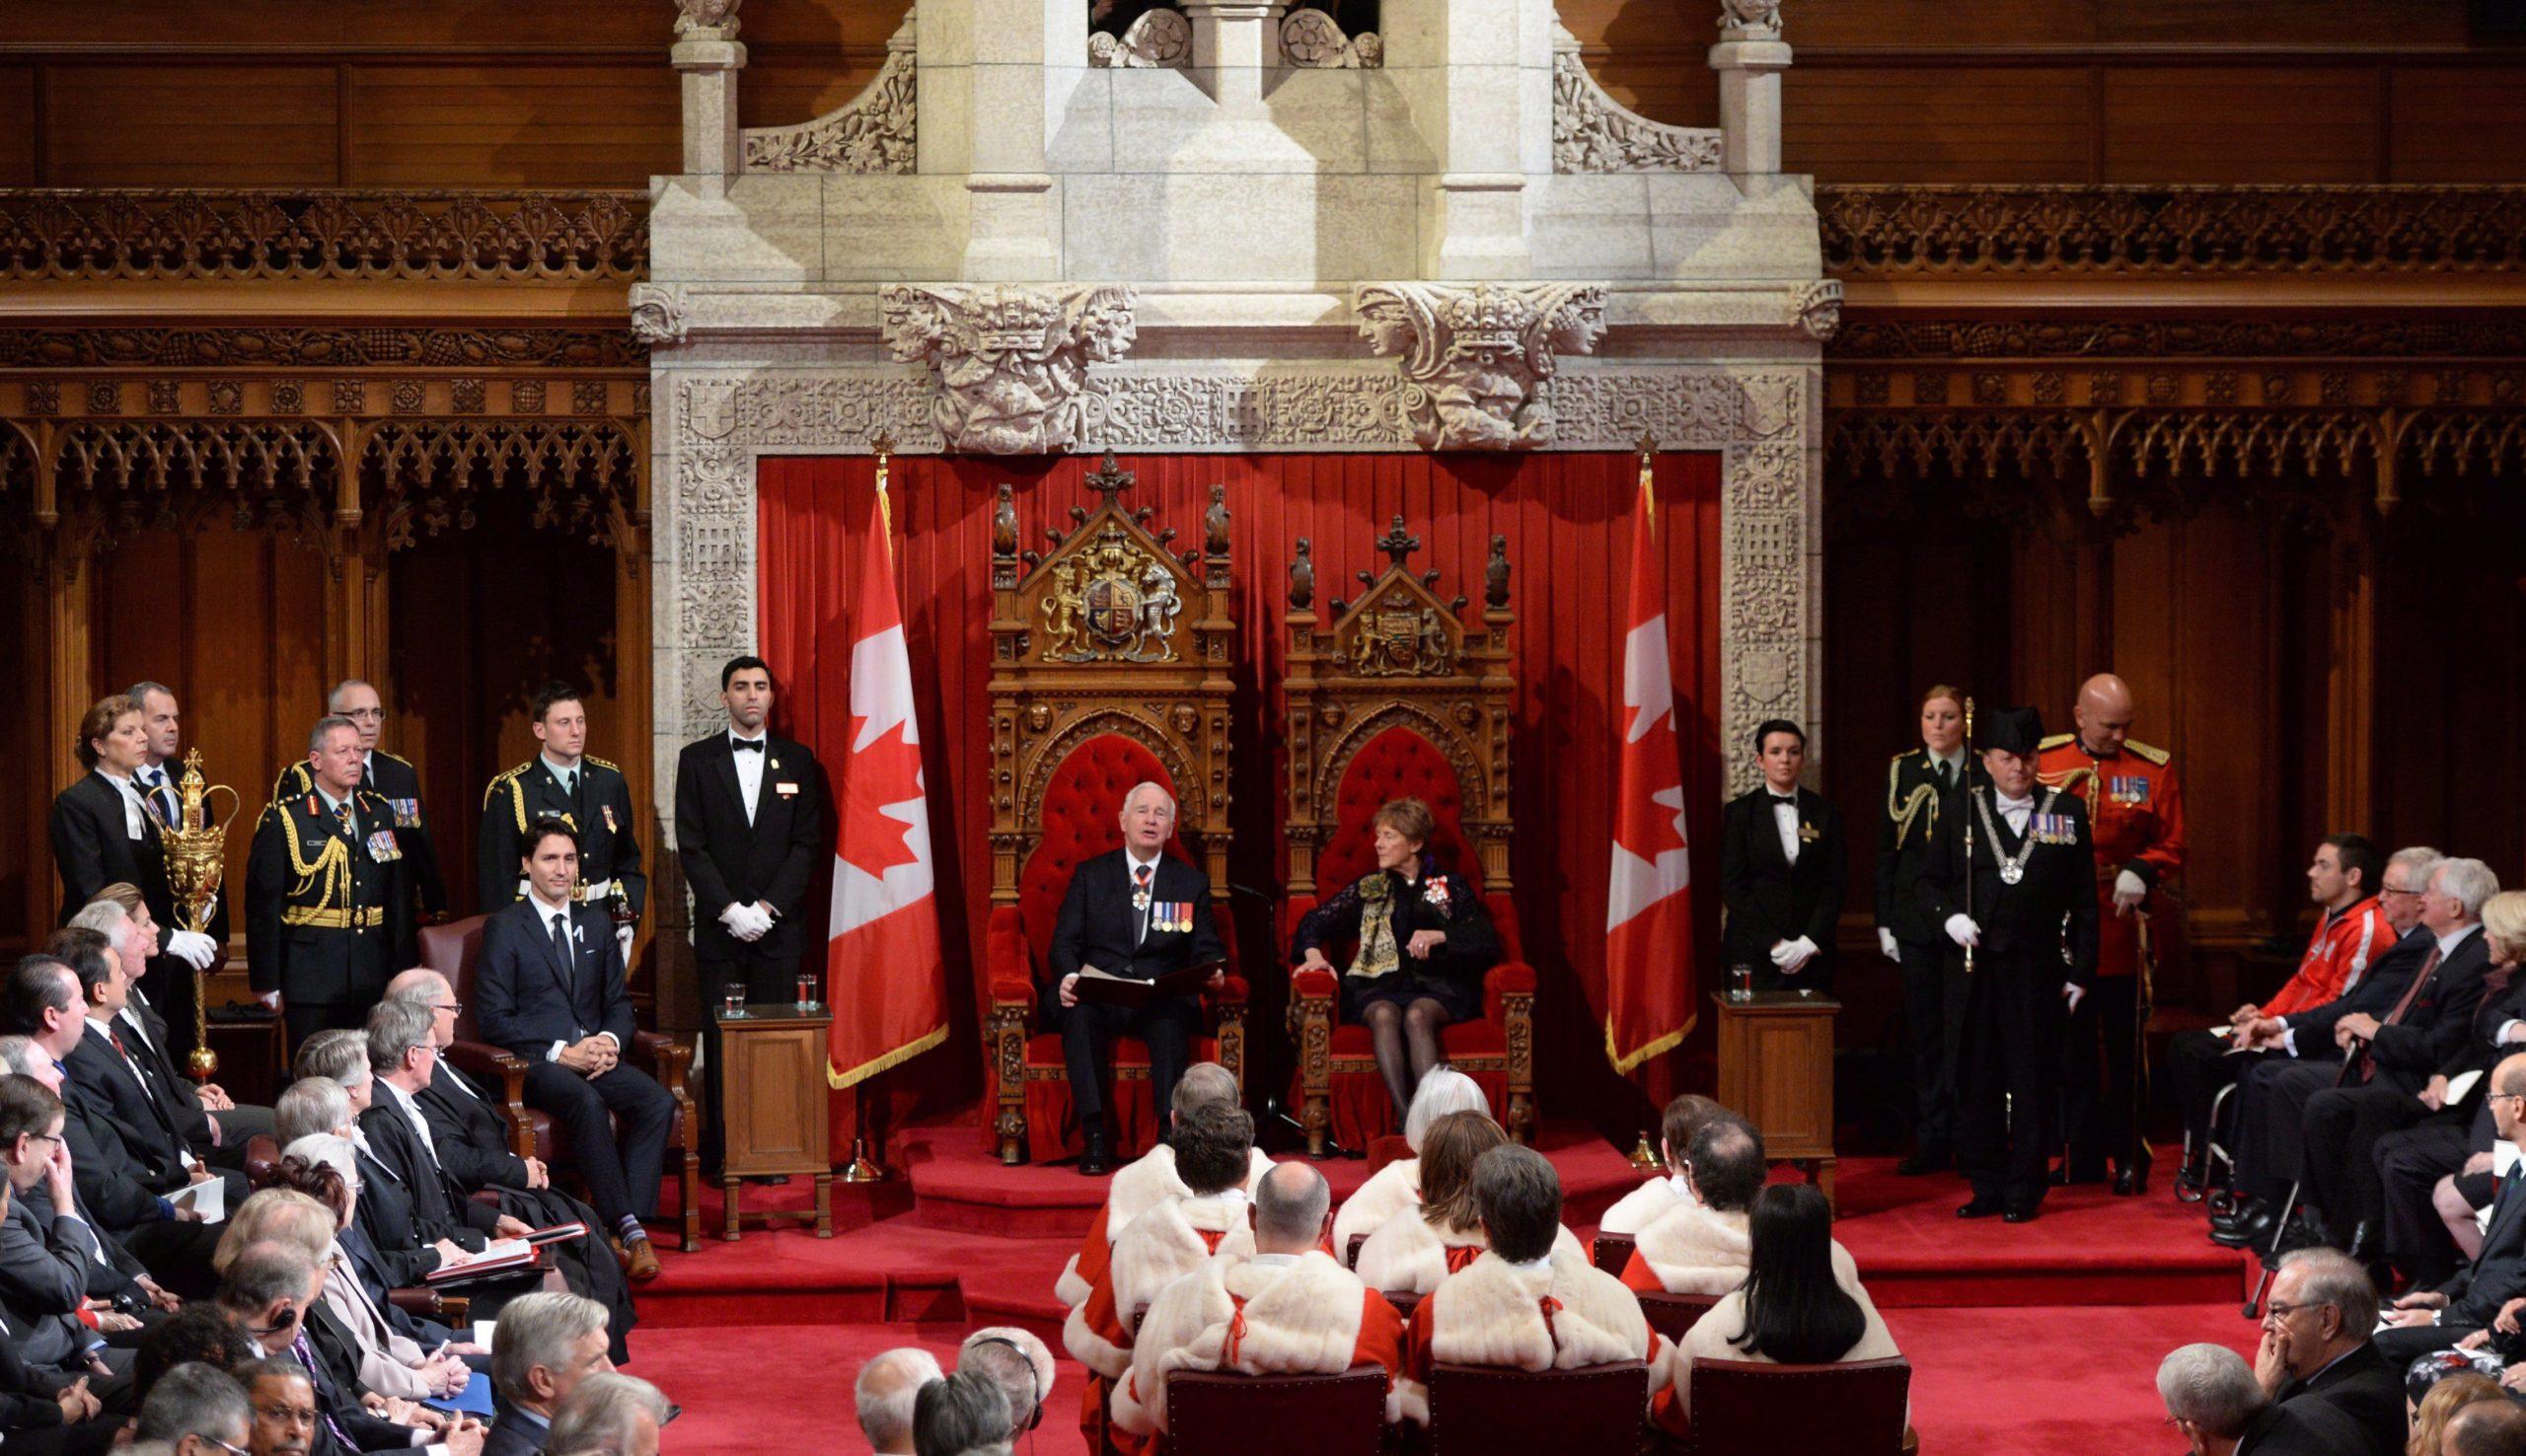 Throne speech; Premiers to meet in Ottawa on Friday